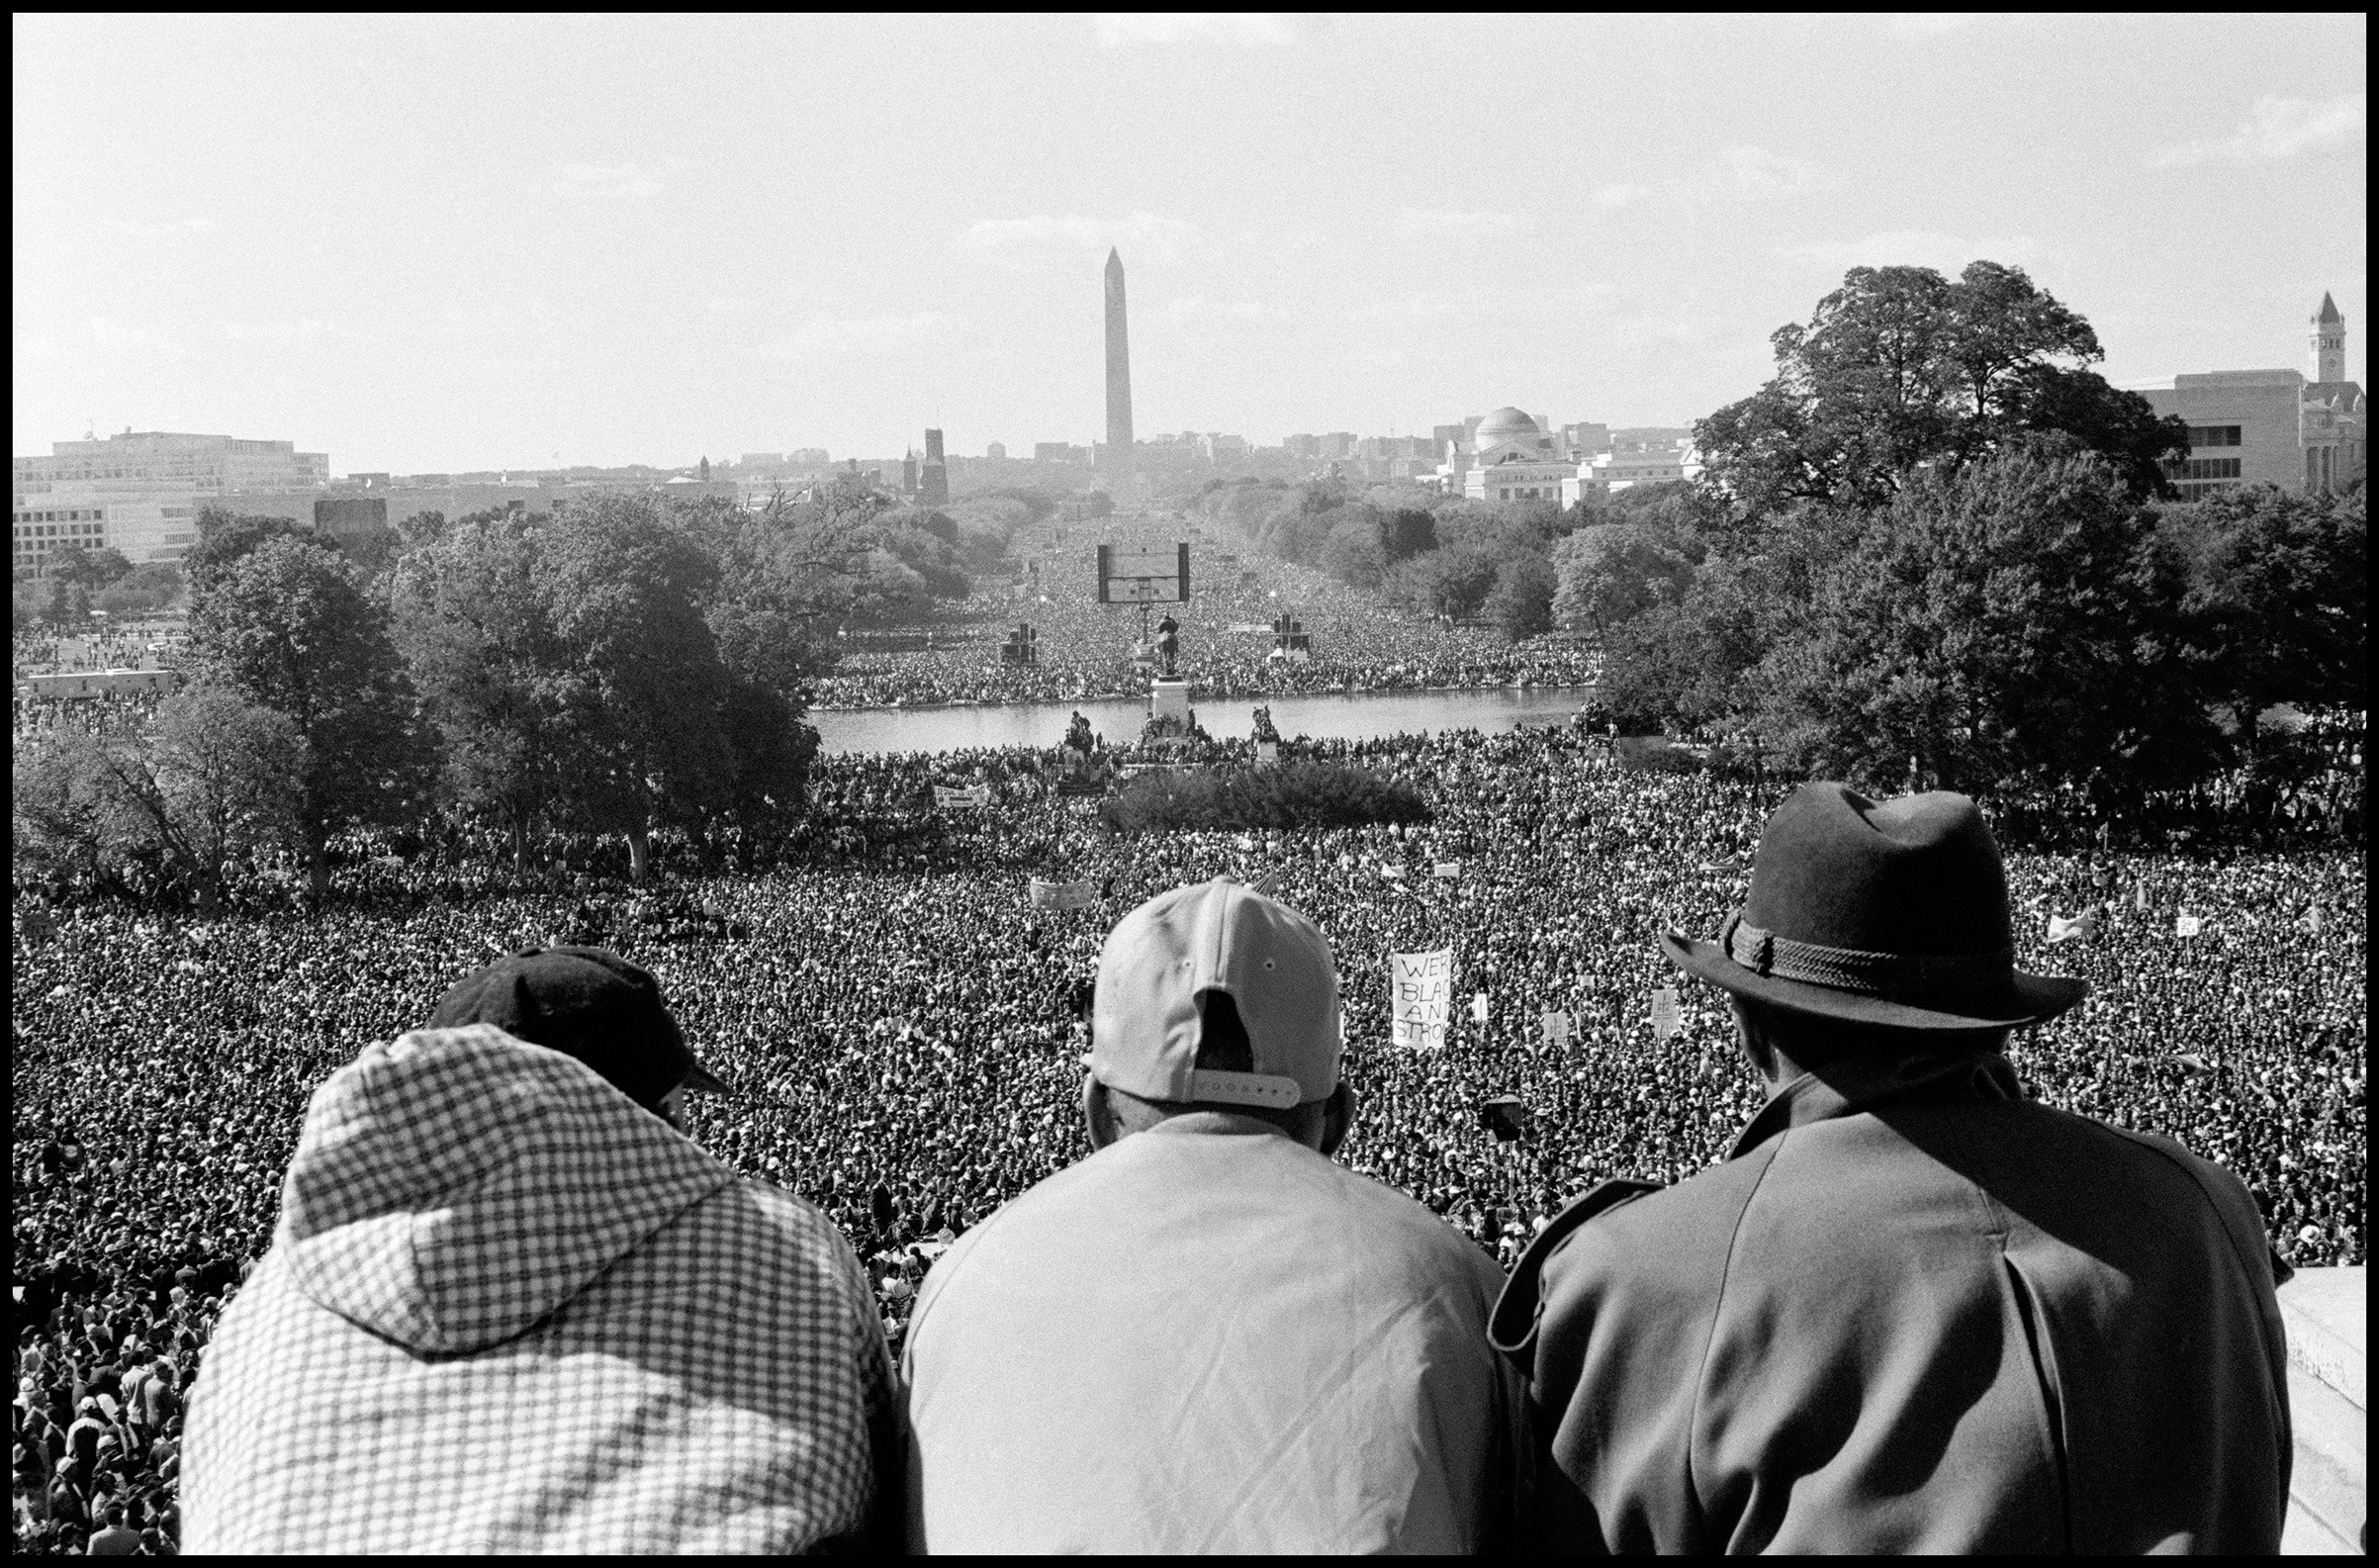 FARRAKHAN demonstration. The Million Man March. Washington, D.C., 1995.